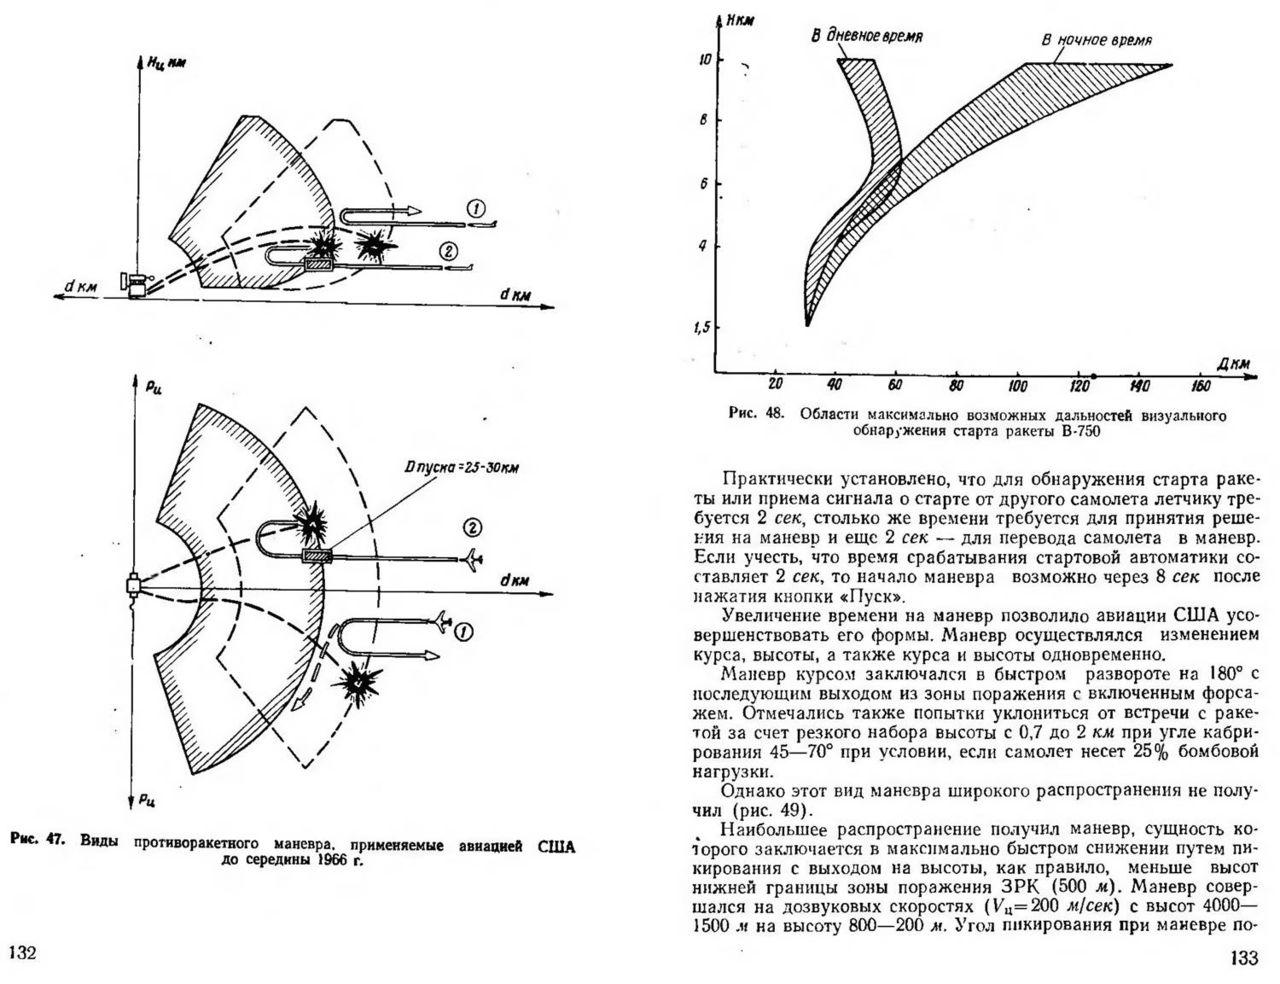 Схема противоракетного маневра